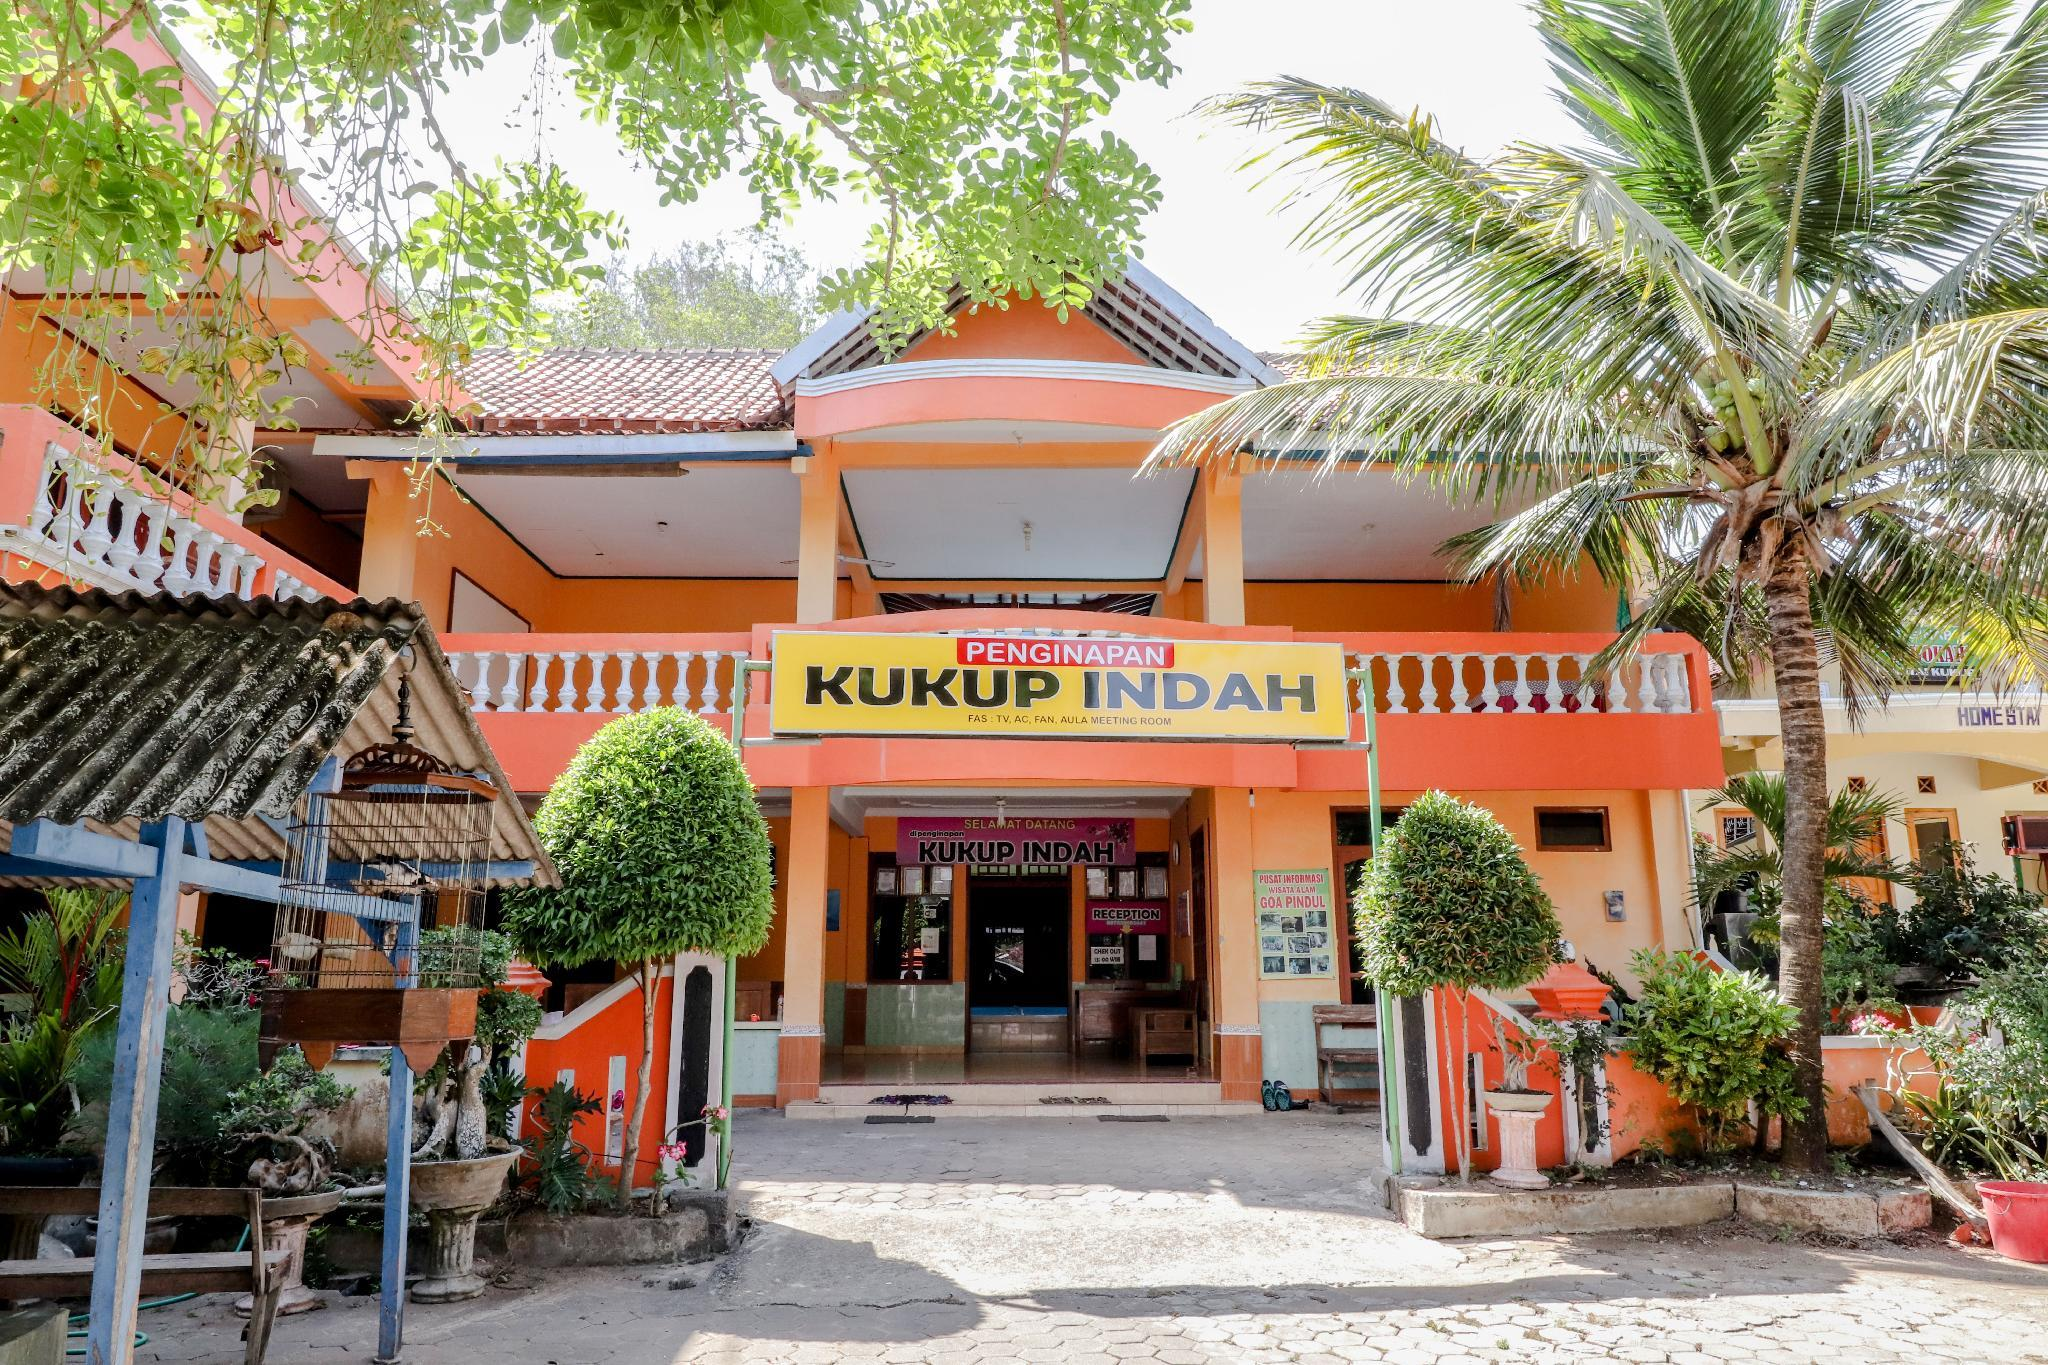 Hotel Kukup Indah